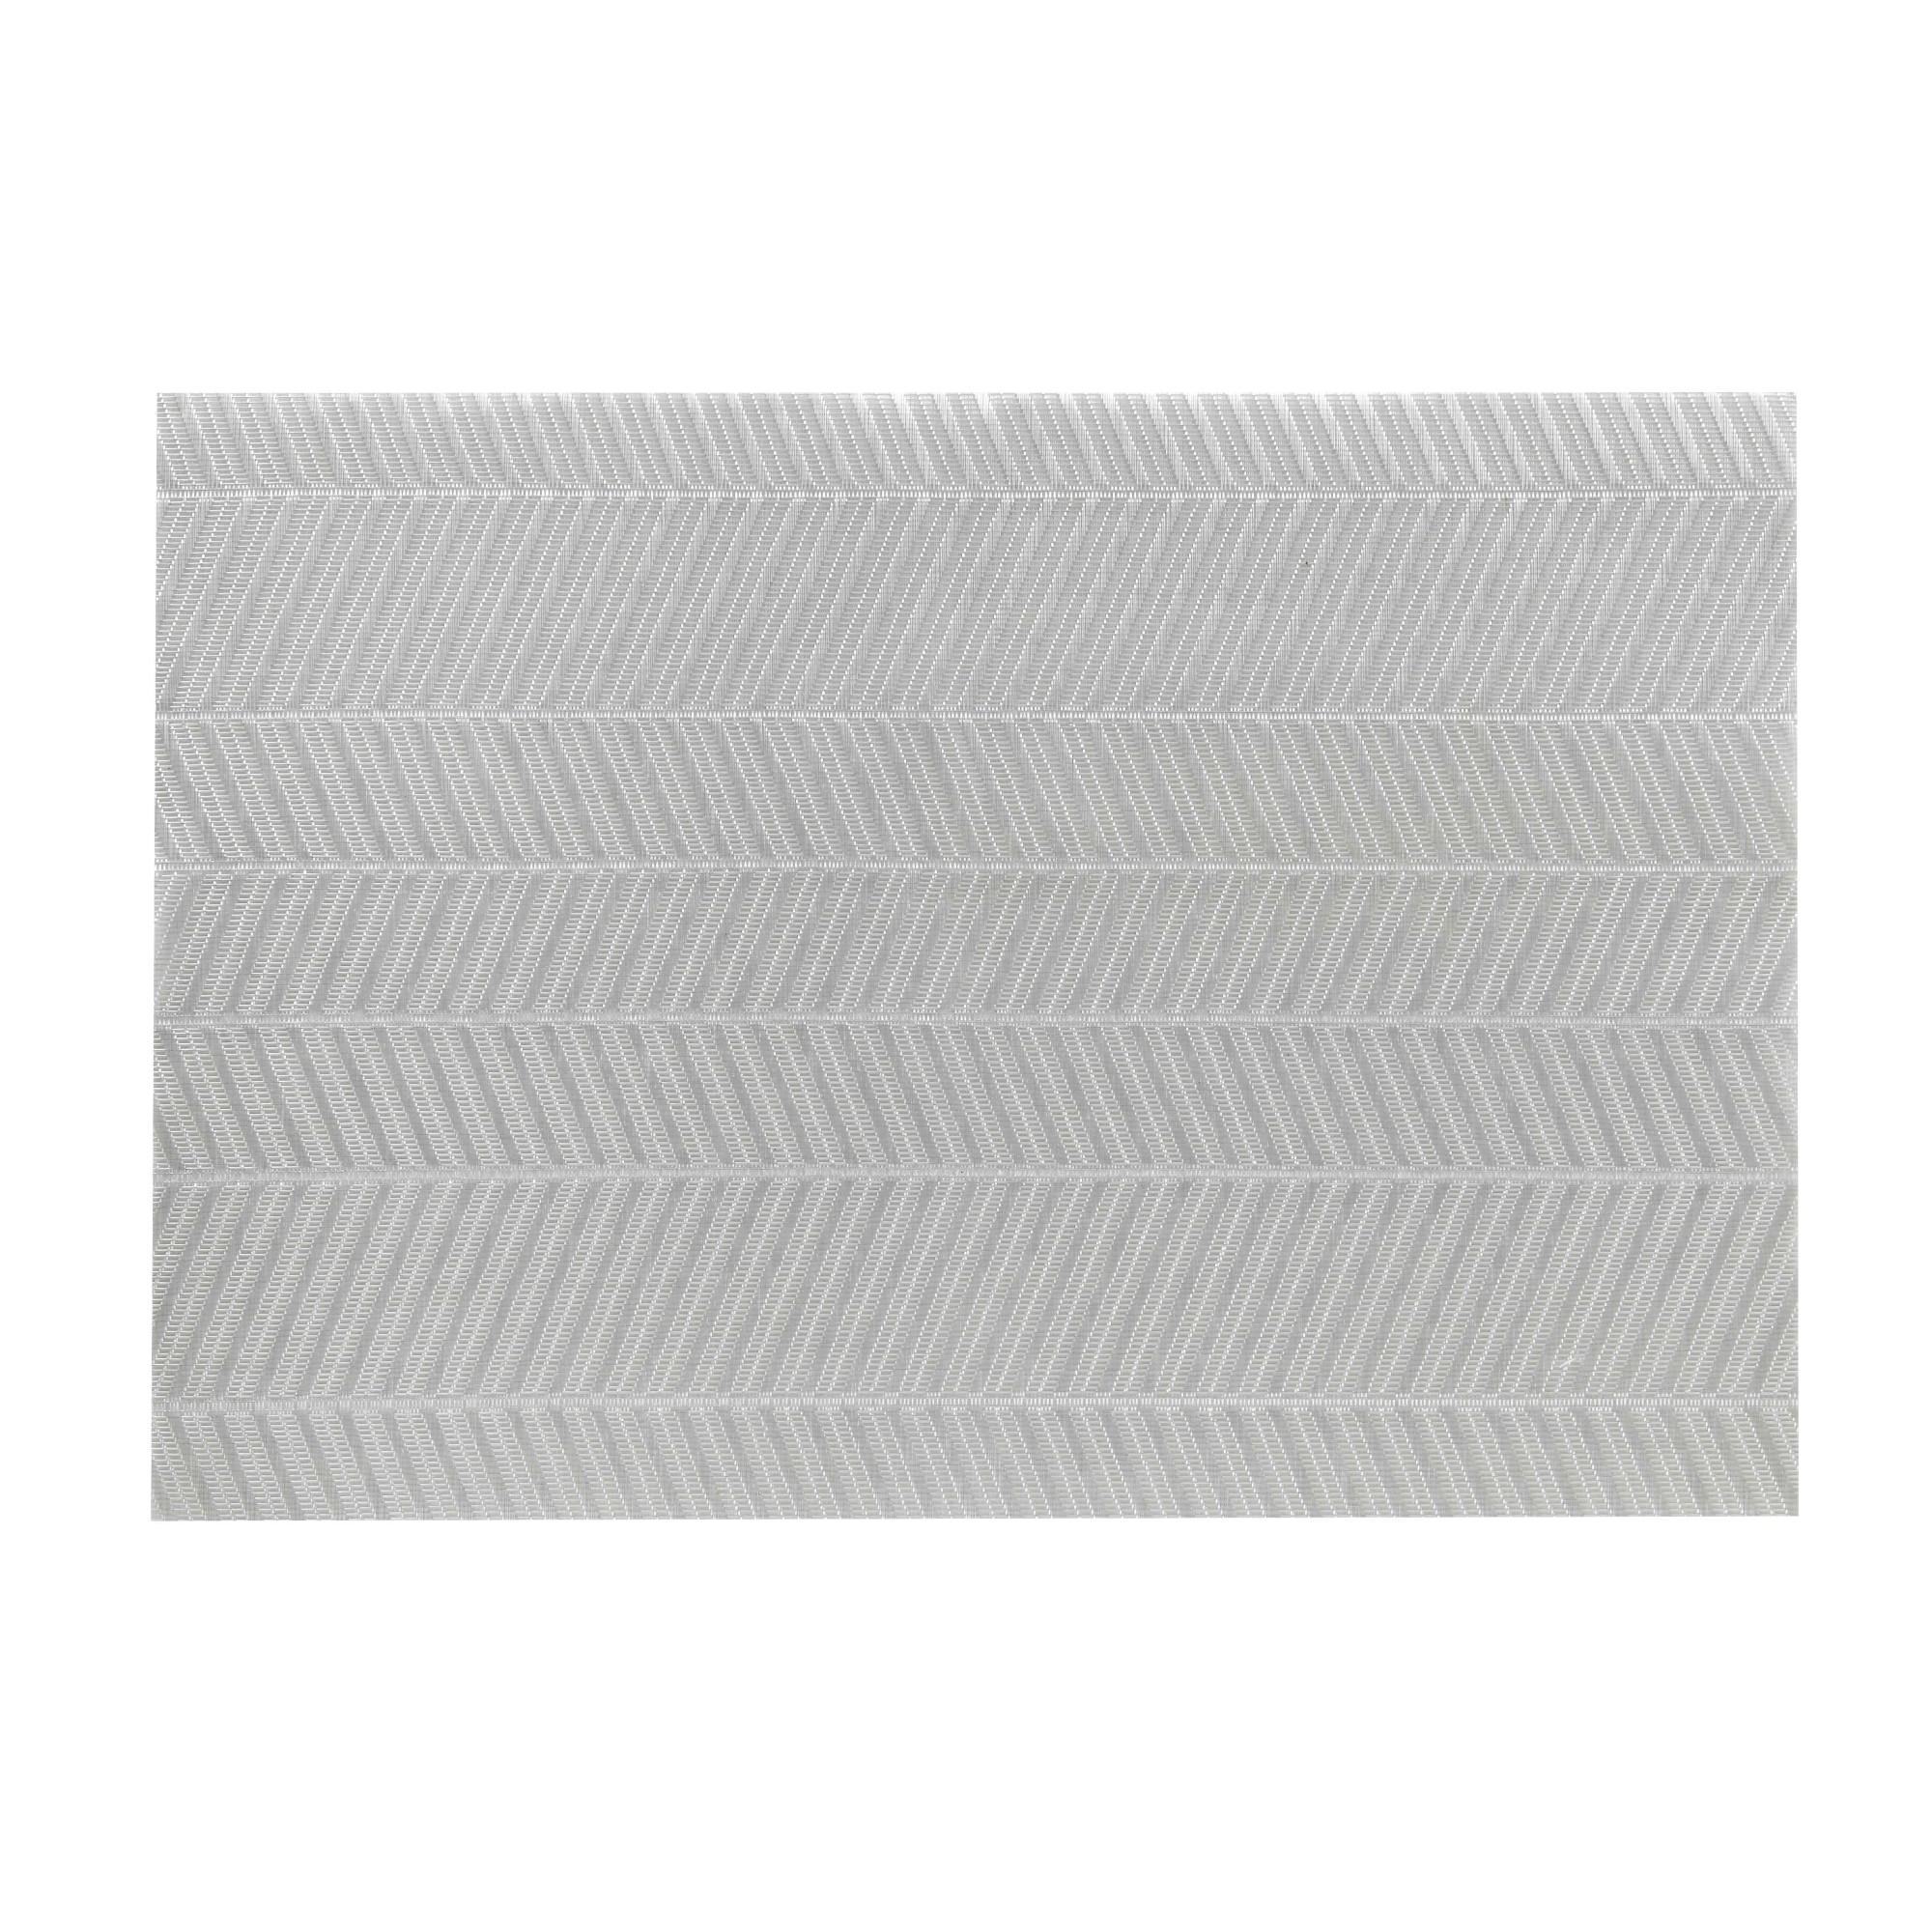 Pano Americano Retangular 35 x 48 cm PVC e Poliester Cinza - CopaCia